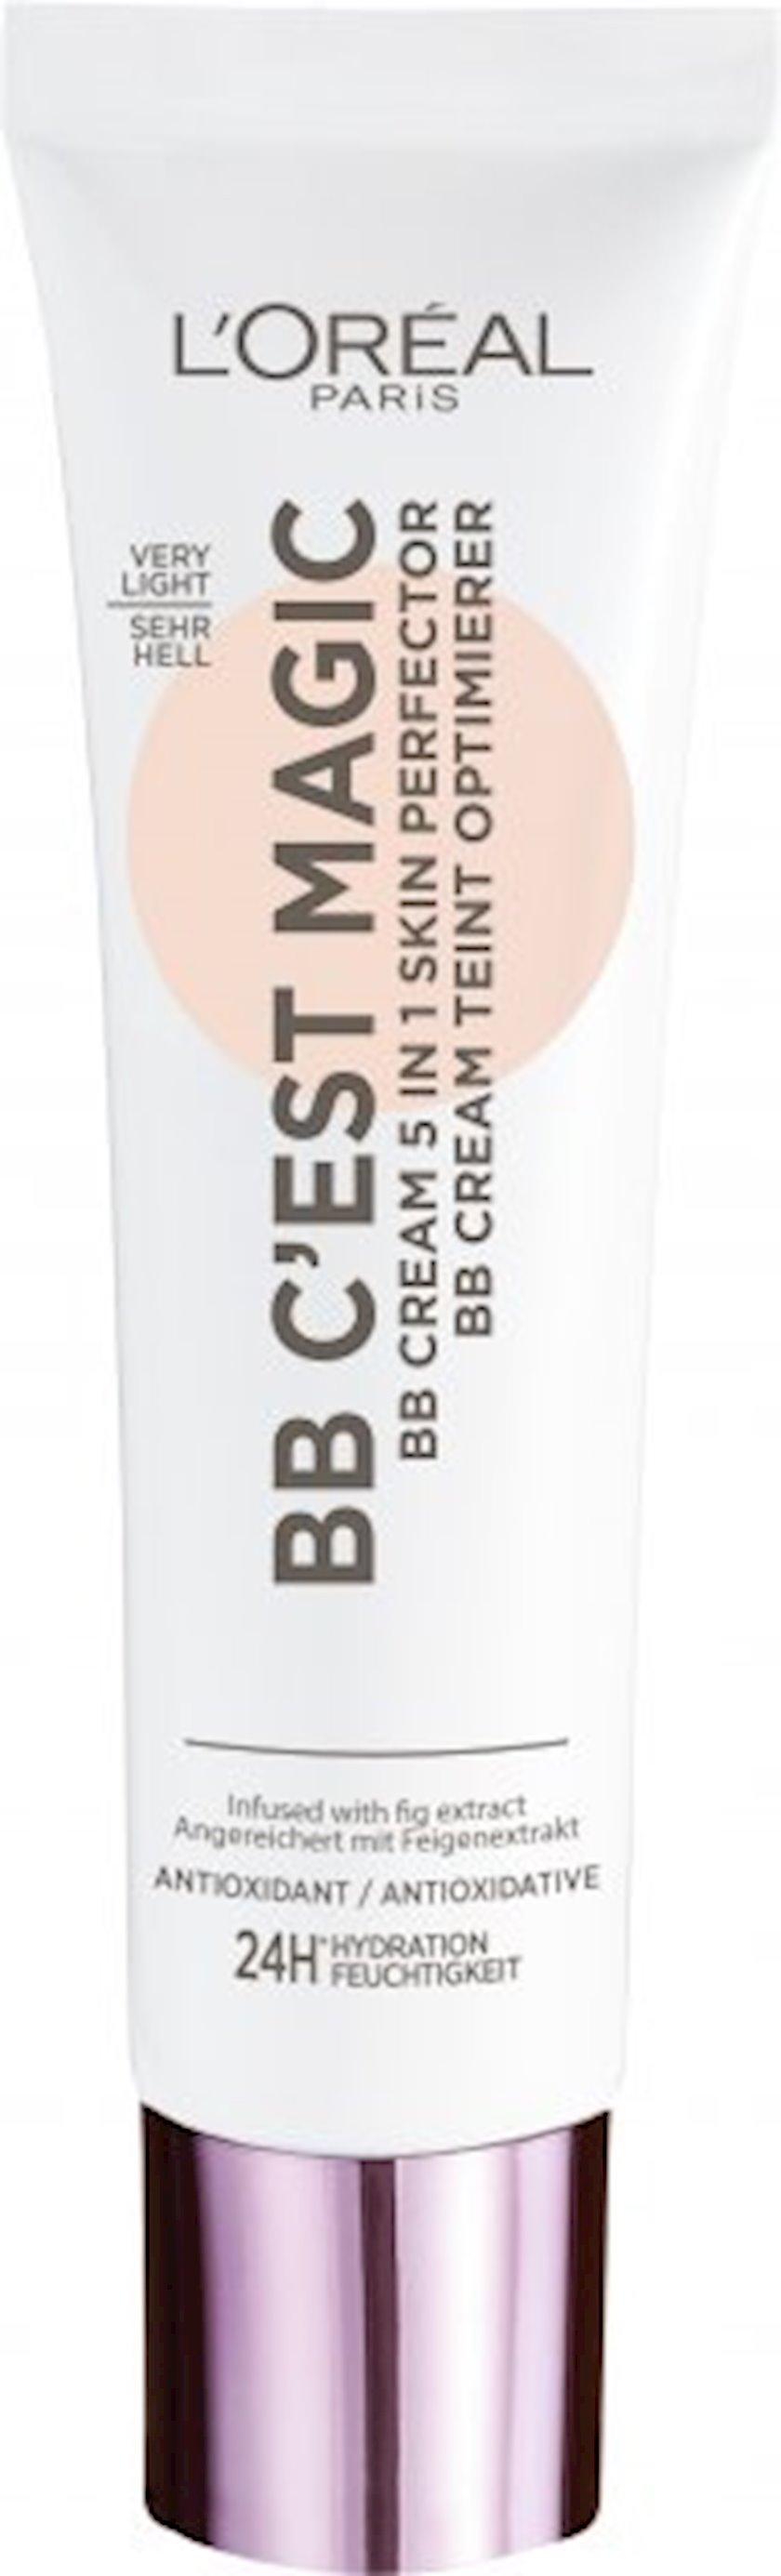 BB krem L'Oréal Paris C'est Magic 5-i birində, 1 Açıq, 30 ml